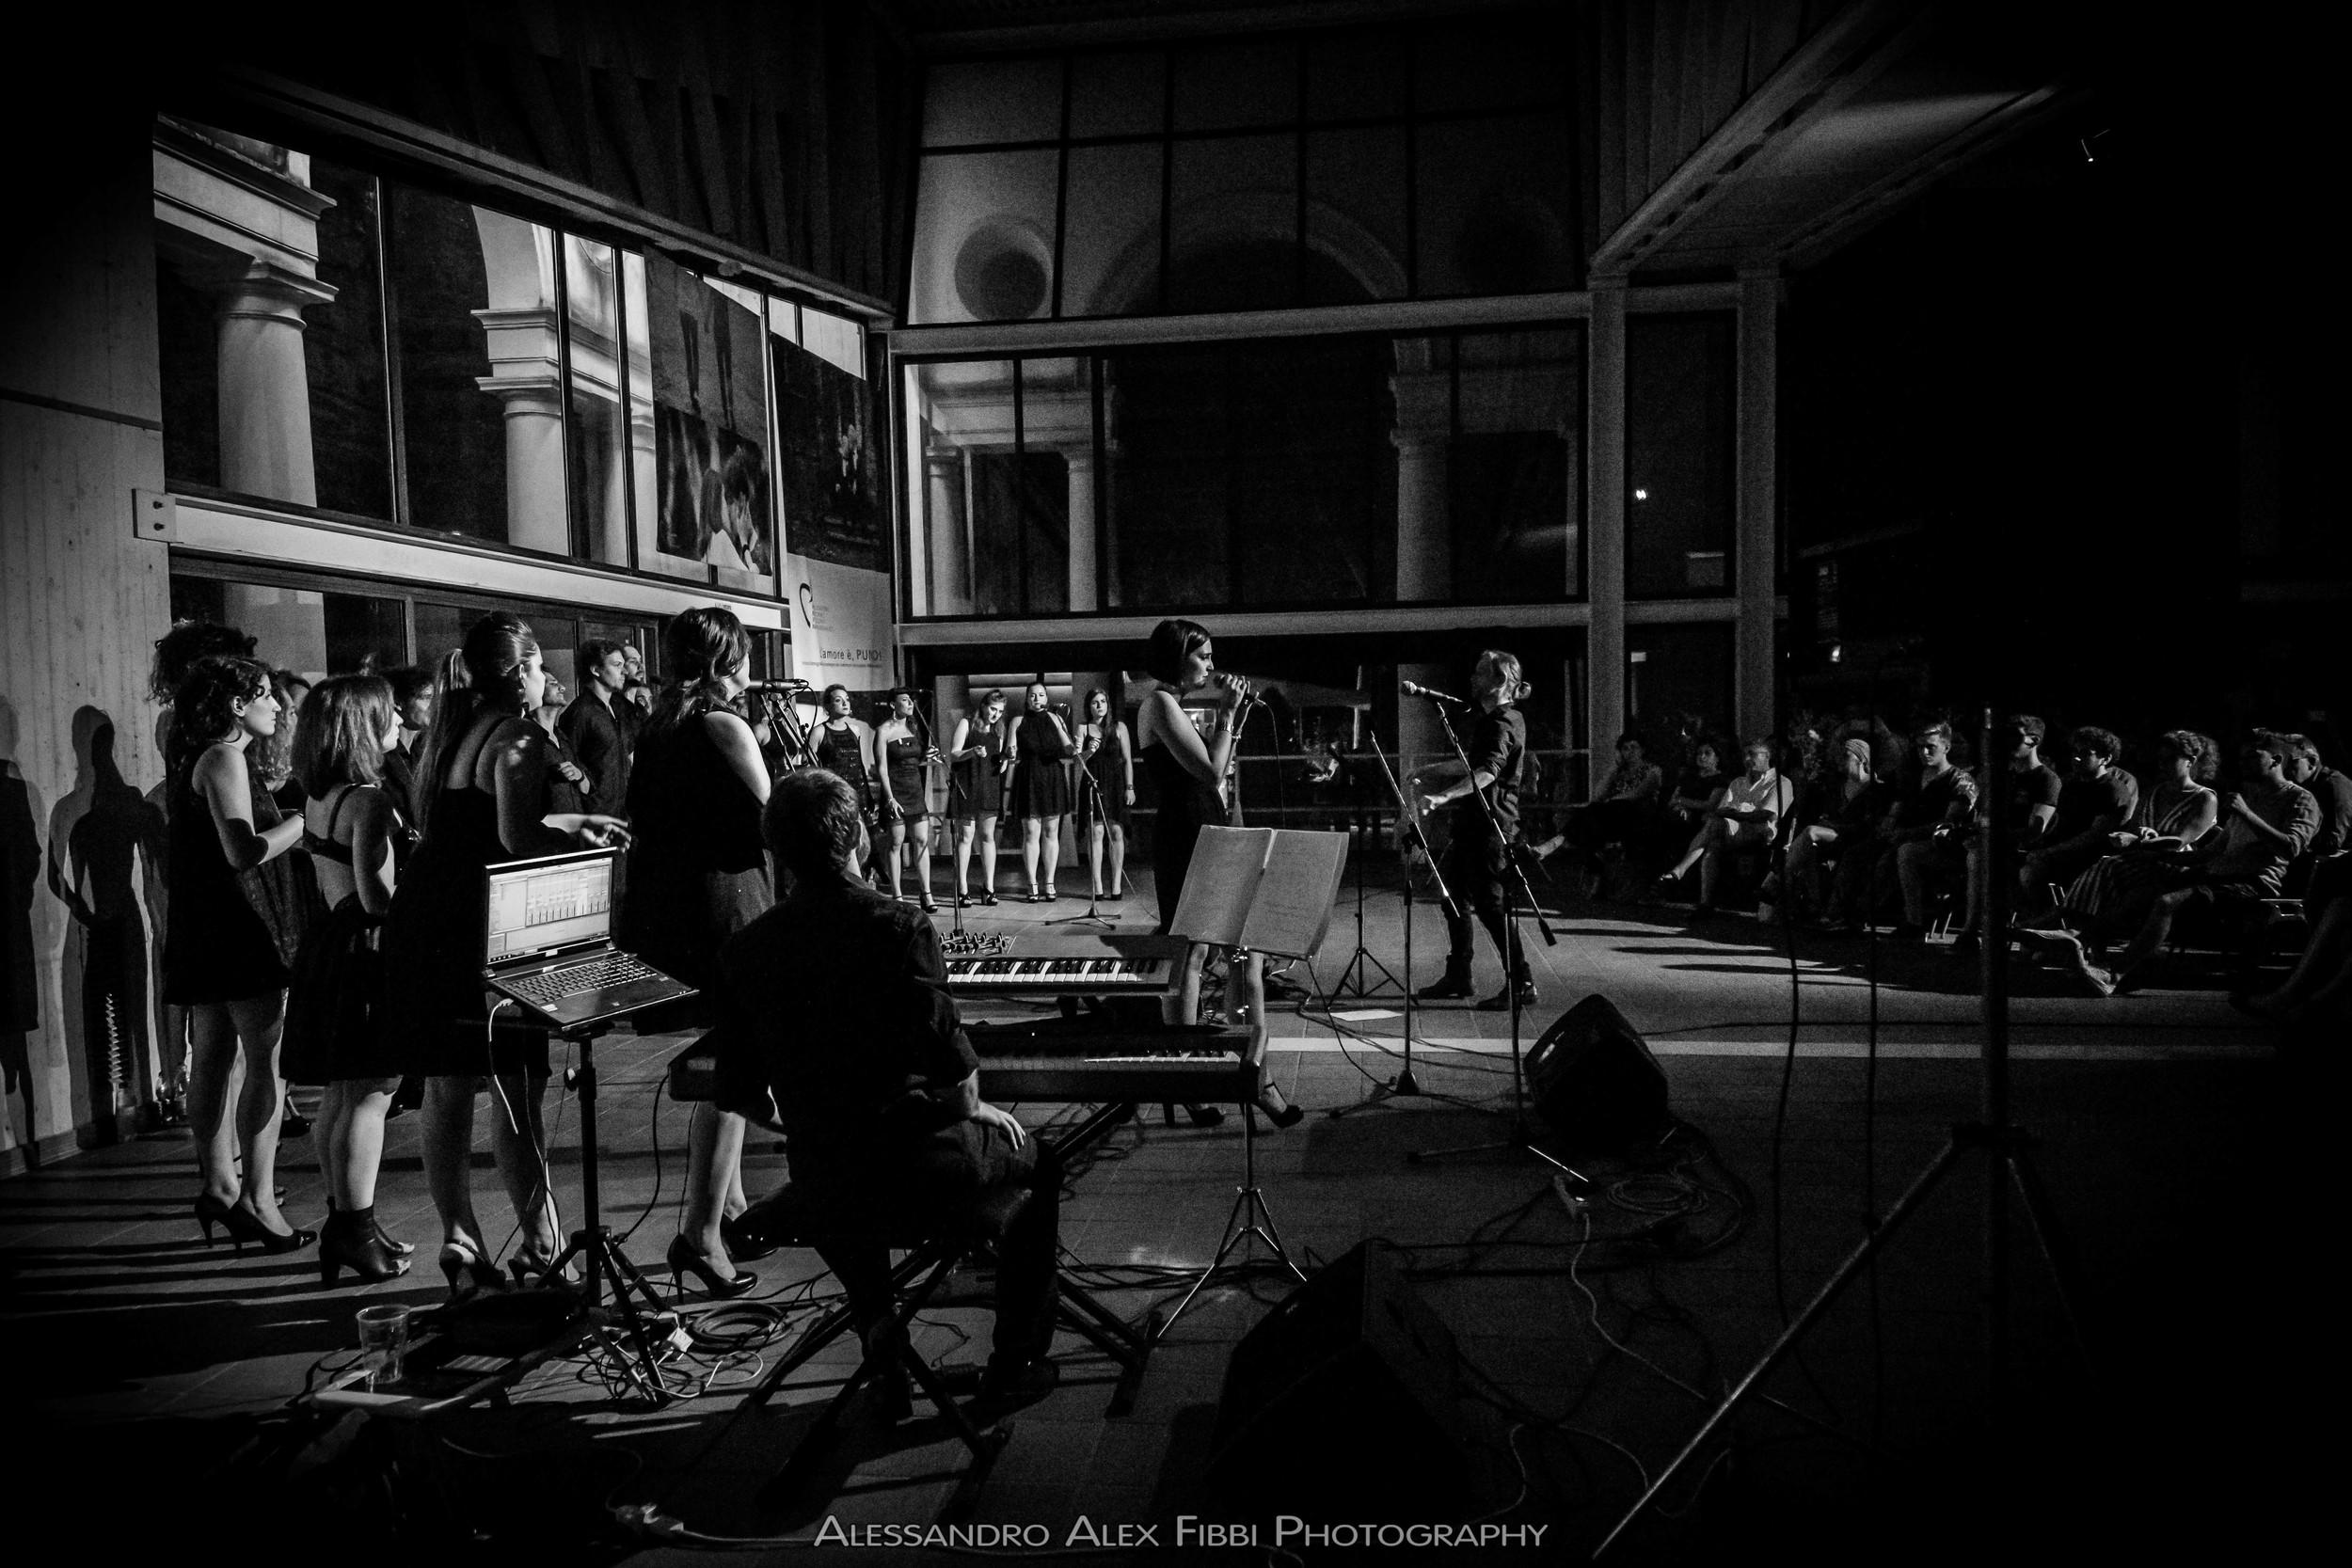 VocalsBlueTrains LIMONAIA 2016 - Alessandro Alex Fibbi Ph-44.JPG